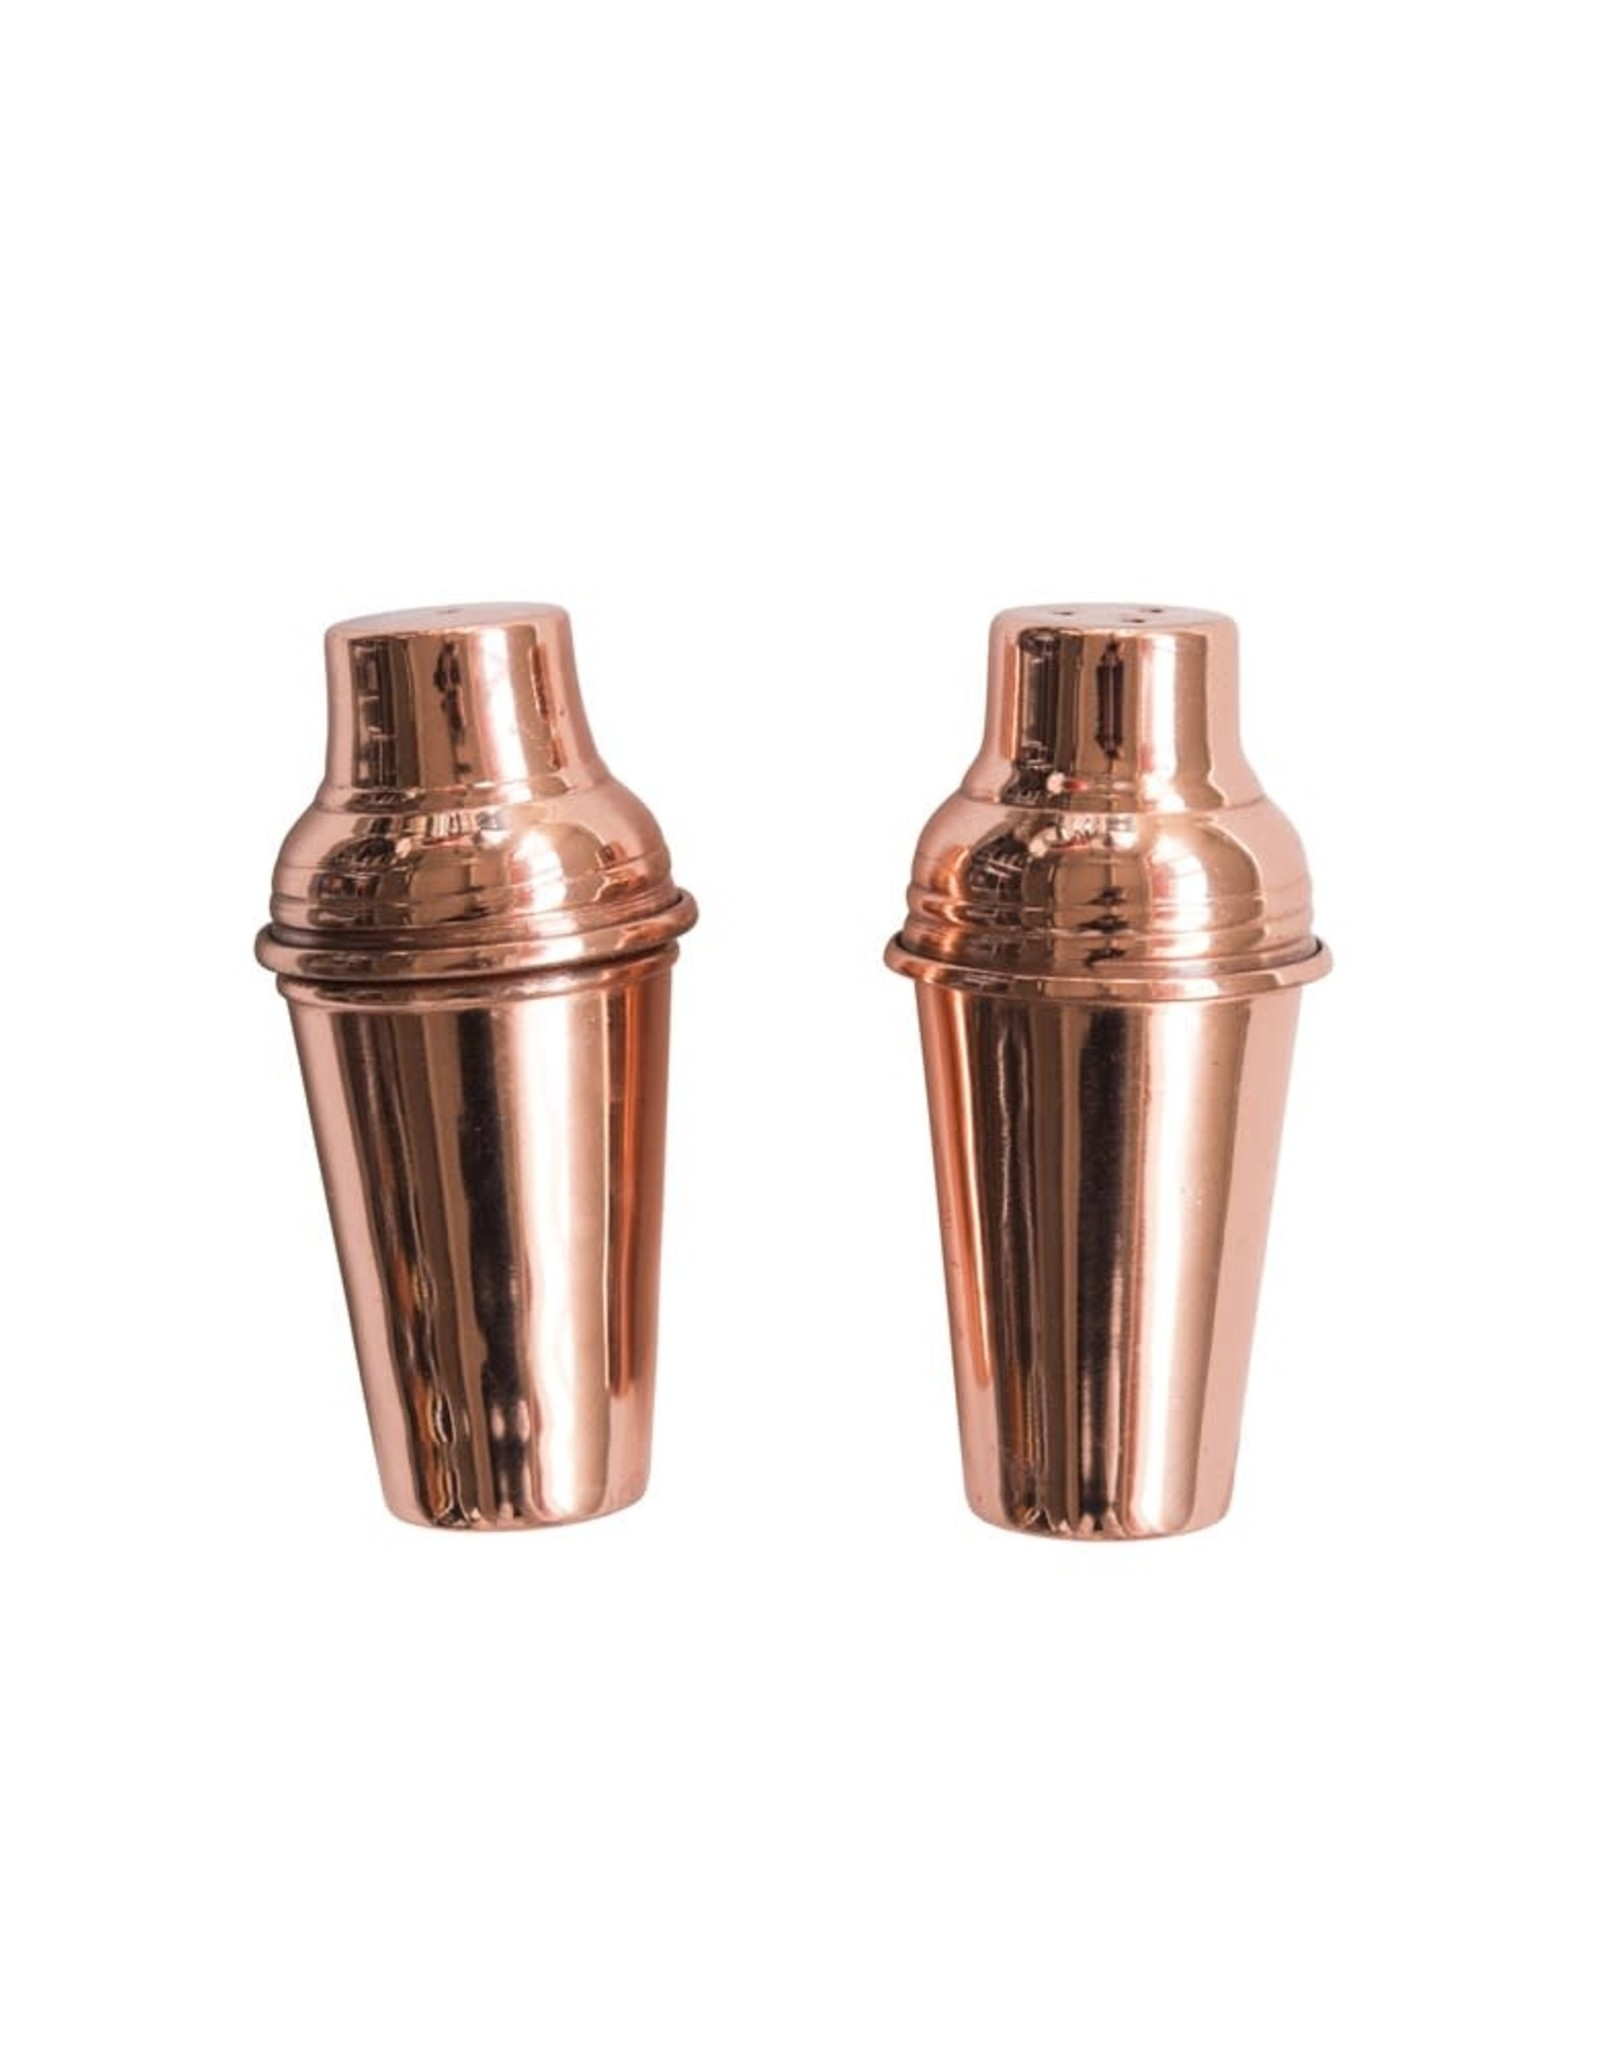 Wink Stainless Steel Salt & Pepper Shaker w/Copper Finish